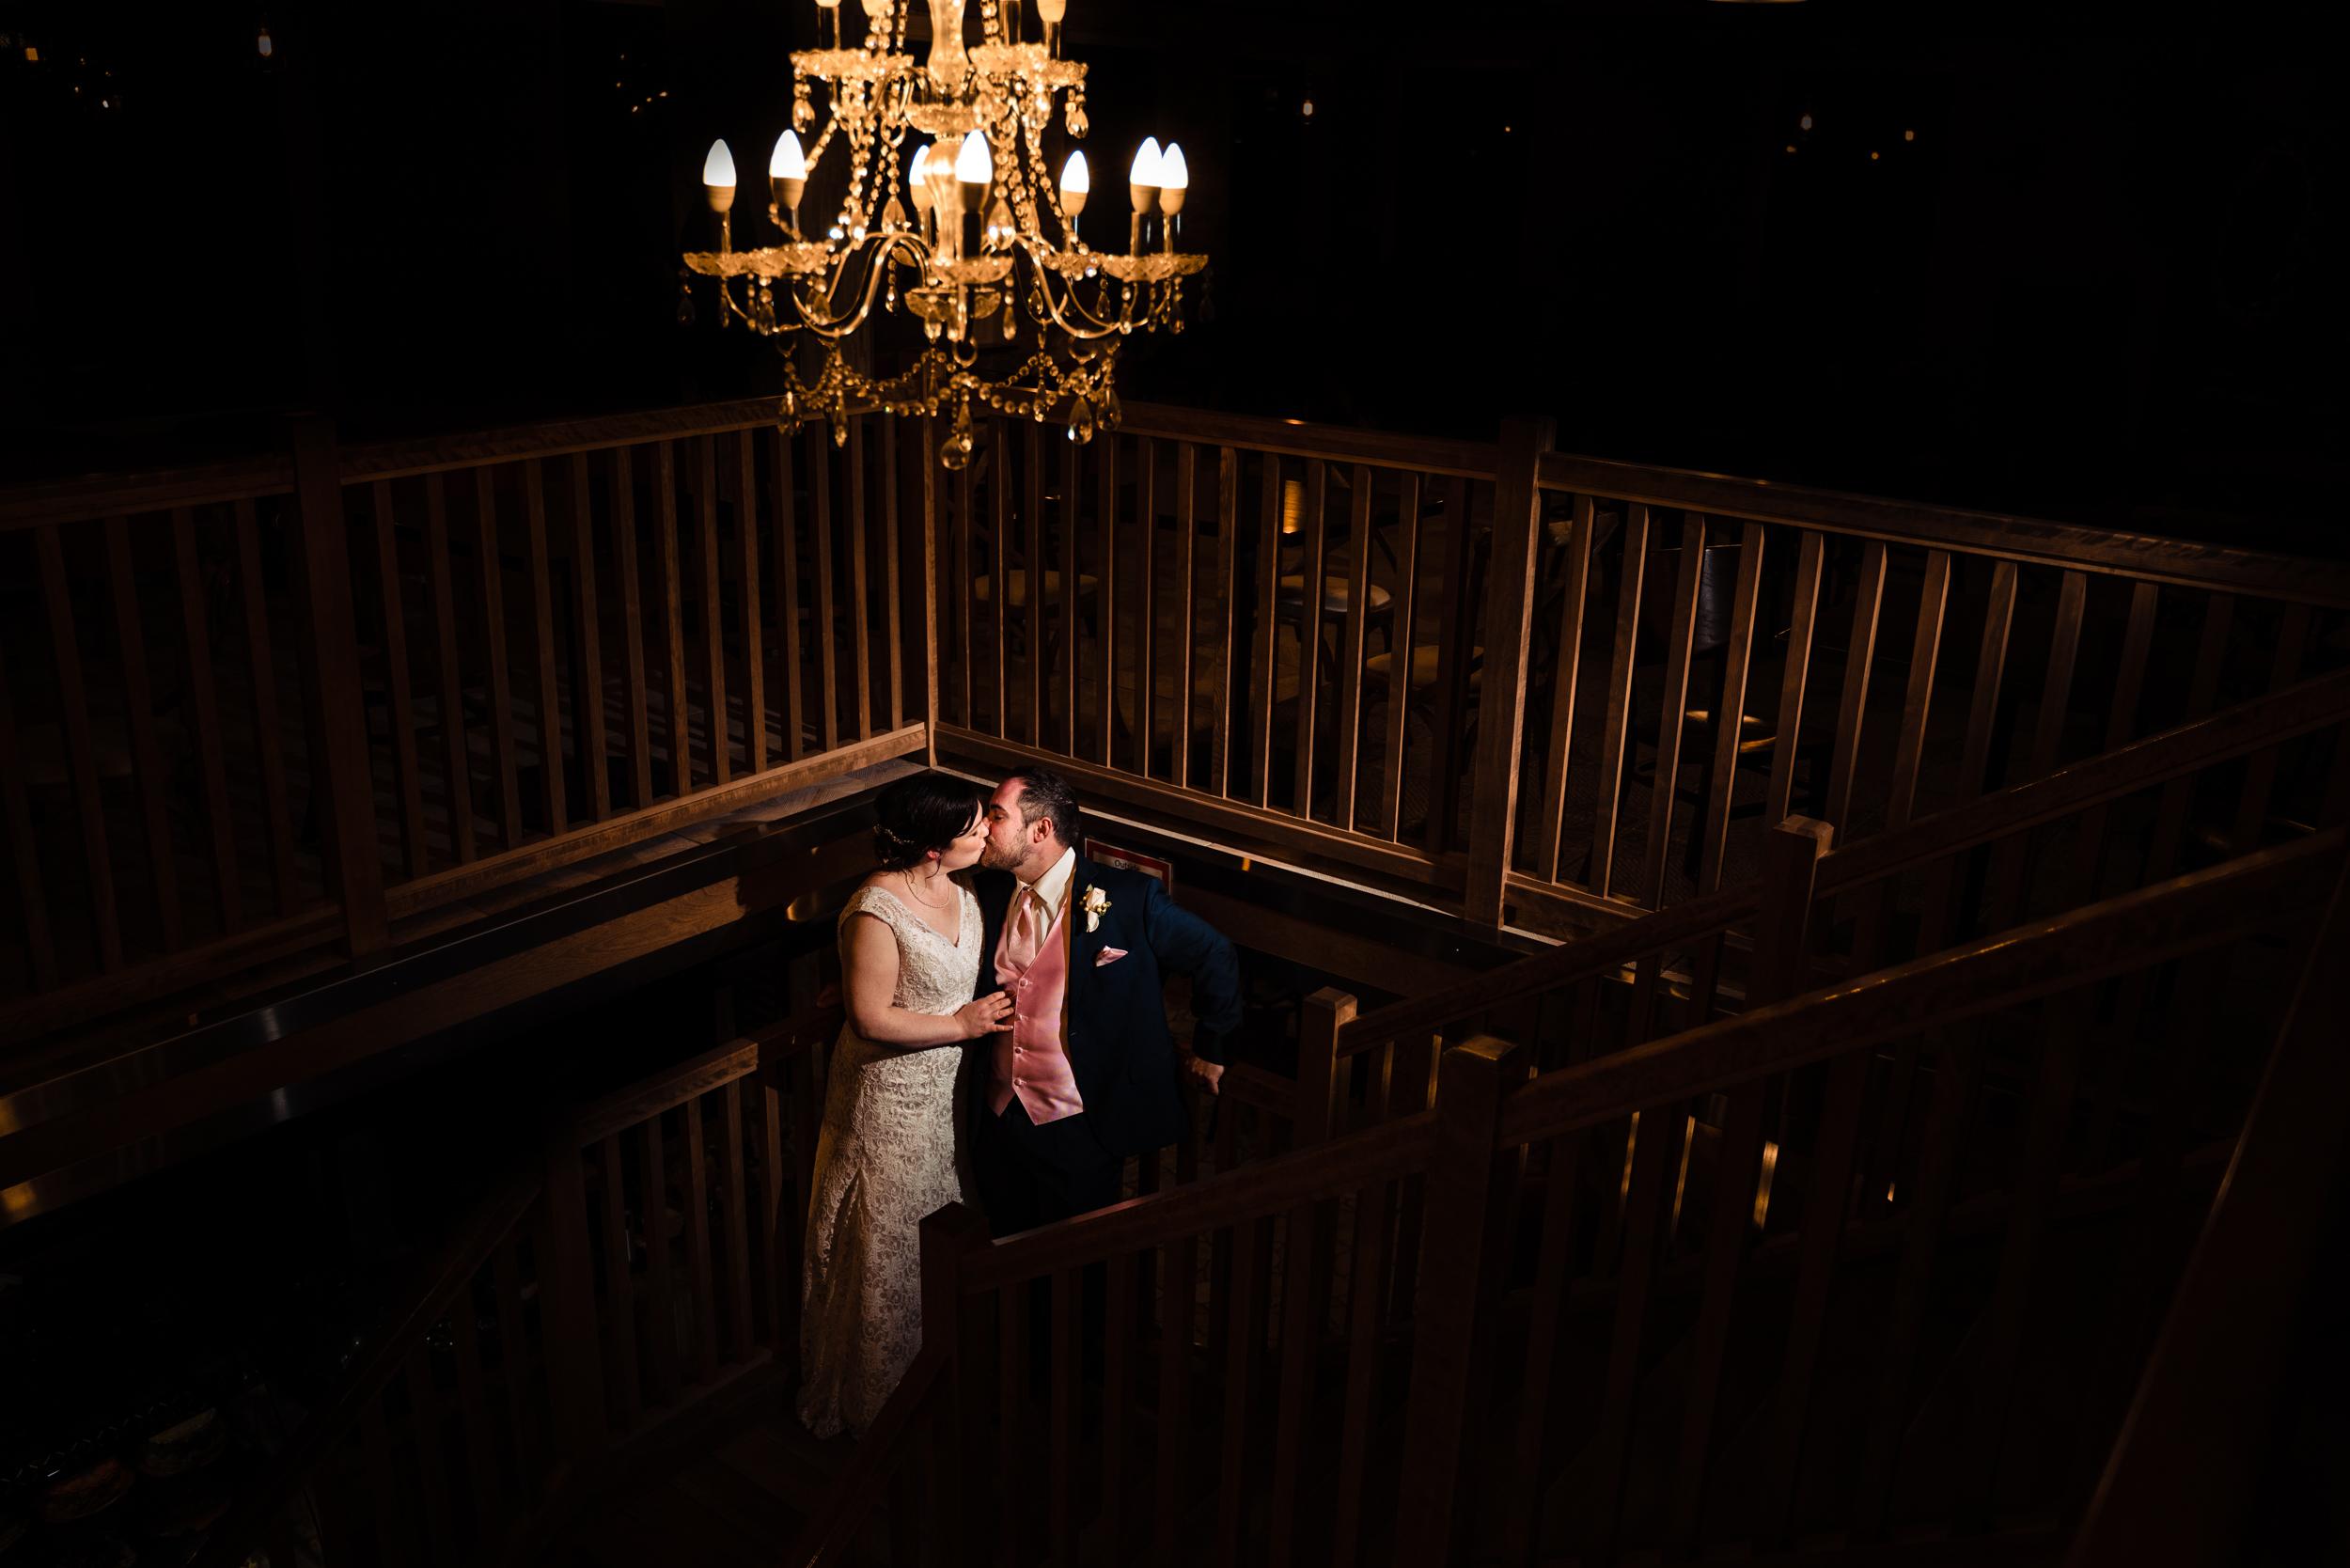 Halifax-wedding-photography-fall-photographers-novascotia-canada-ottawa (107 of 113).jpg